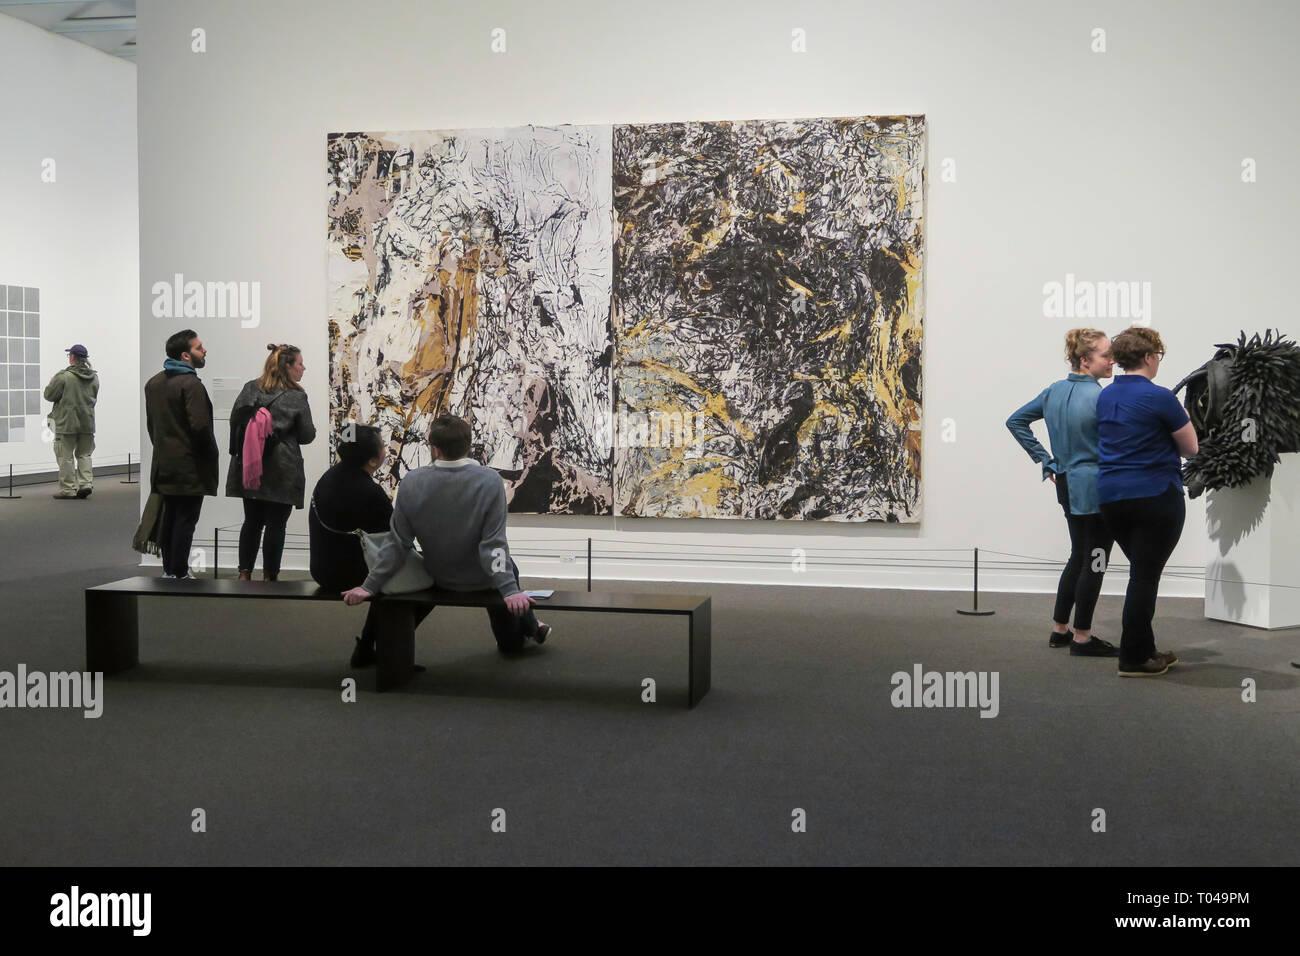 Epic Abstraction: Pollock to Herrera exhibit at the Metropolitan Museum of Art, New York City, USA - Stock Image